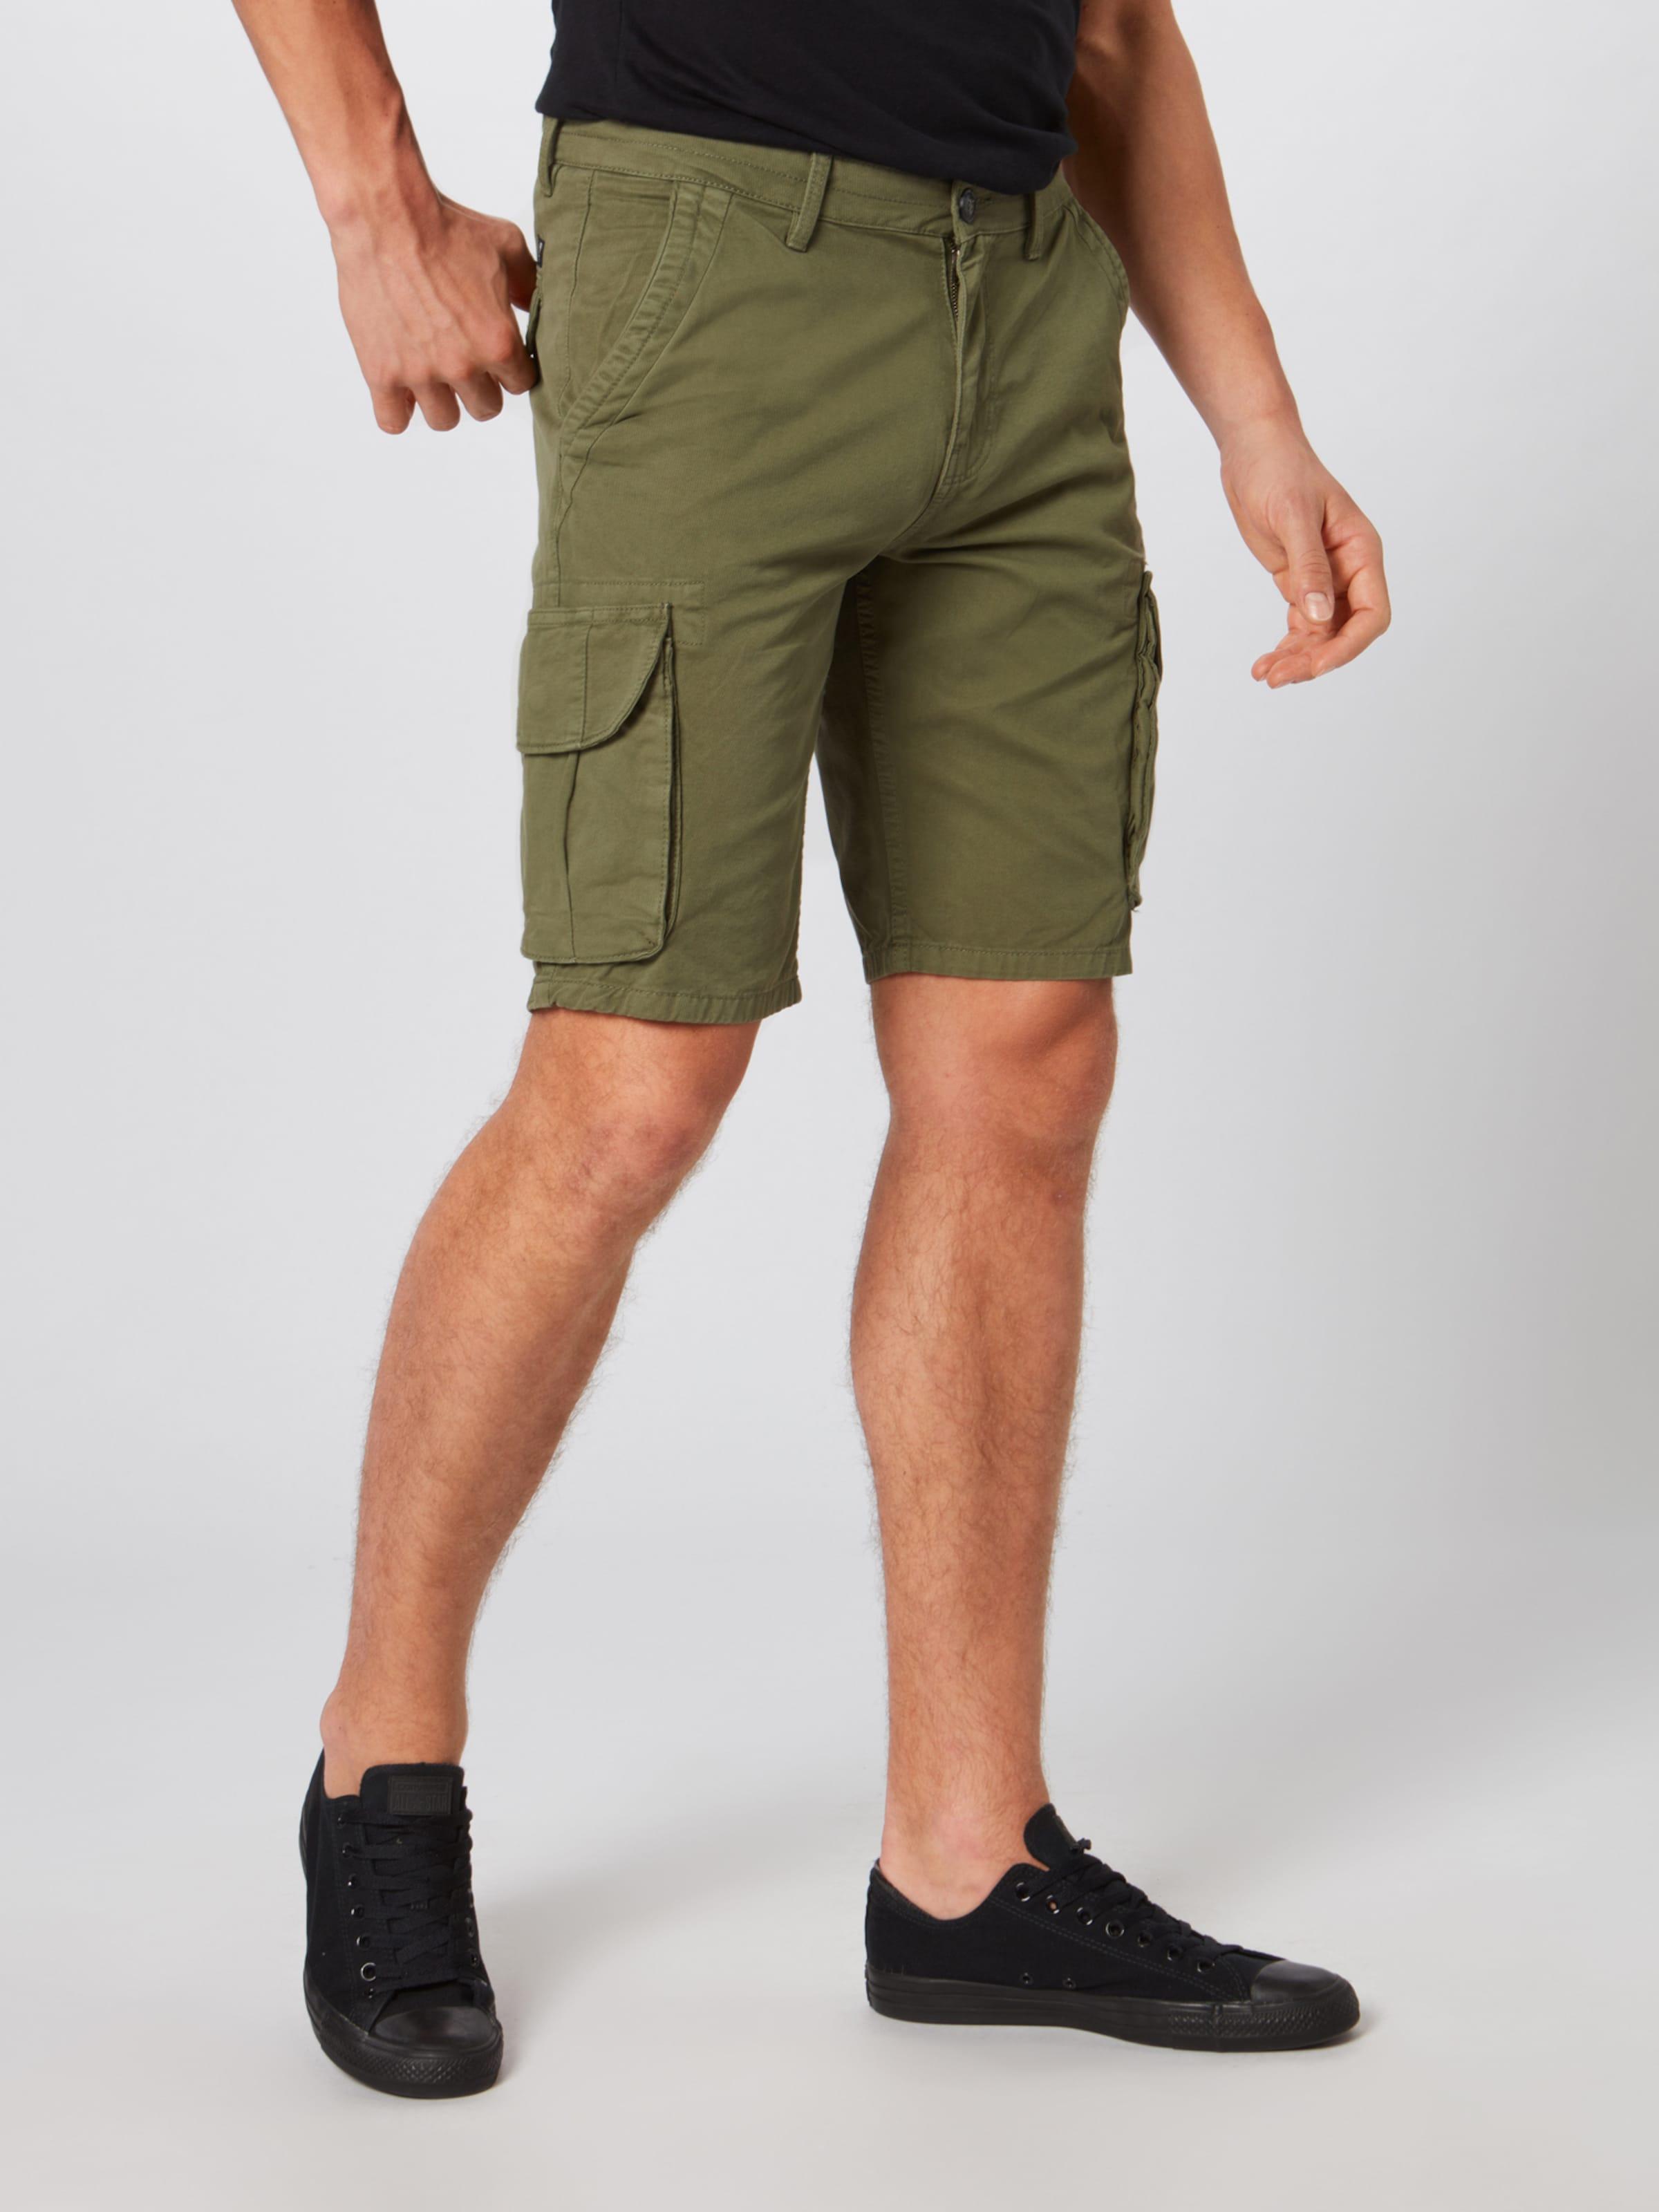 Pantalon Cargo En Tom Tailor Kaki Denim qjSGzMLUVp